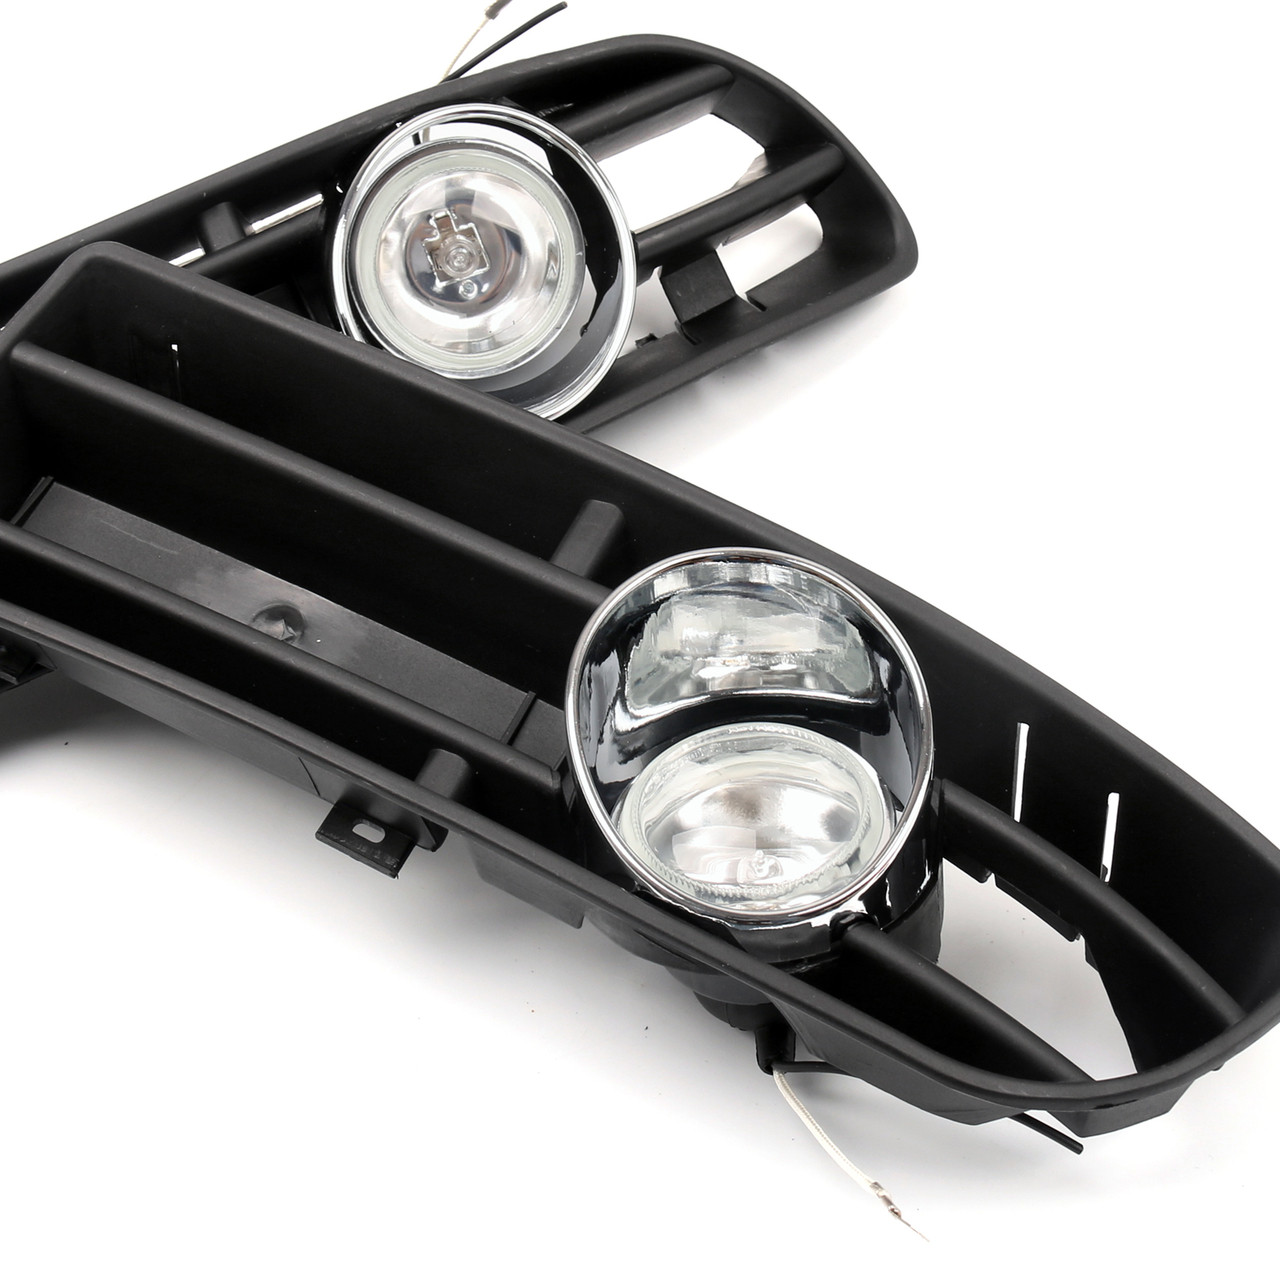 Bumper Grille Grill with Driving Fog Lamp Light VW JETTA BORA MK4 TDI (99-04)